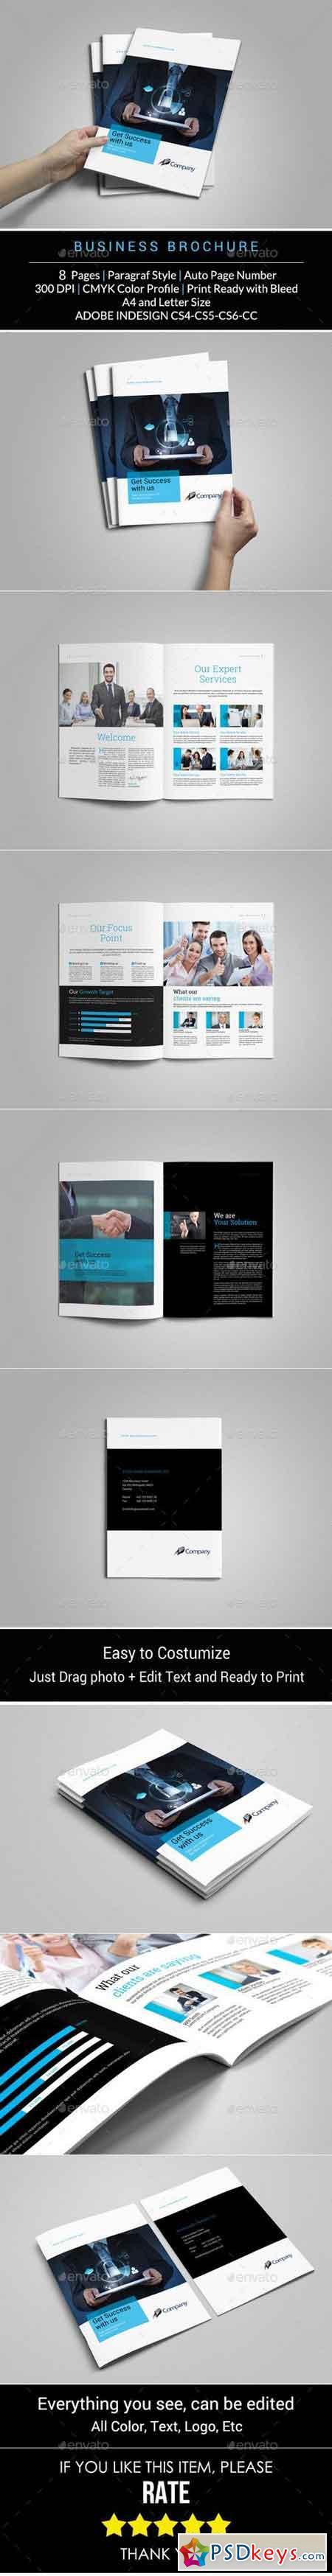 Indesign » Free Download Photoshop Vector Stock image Via Torrent ...